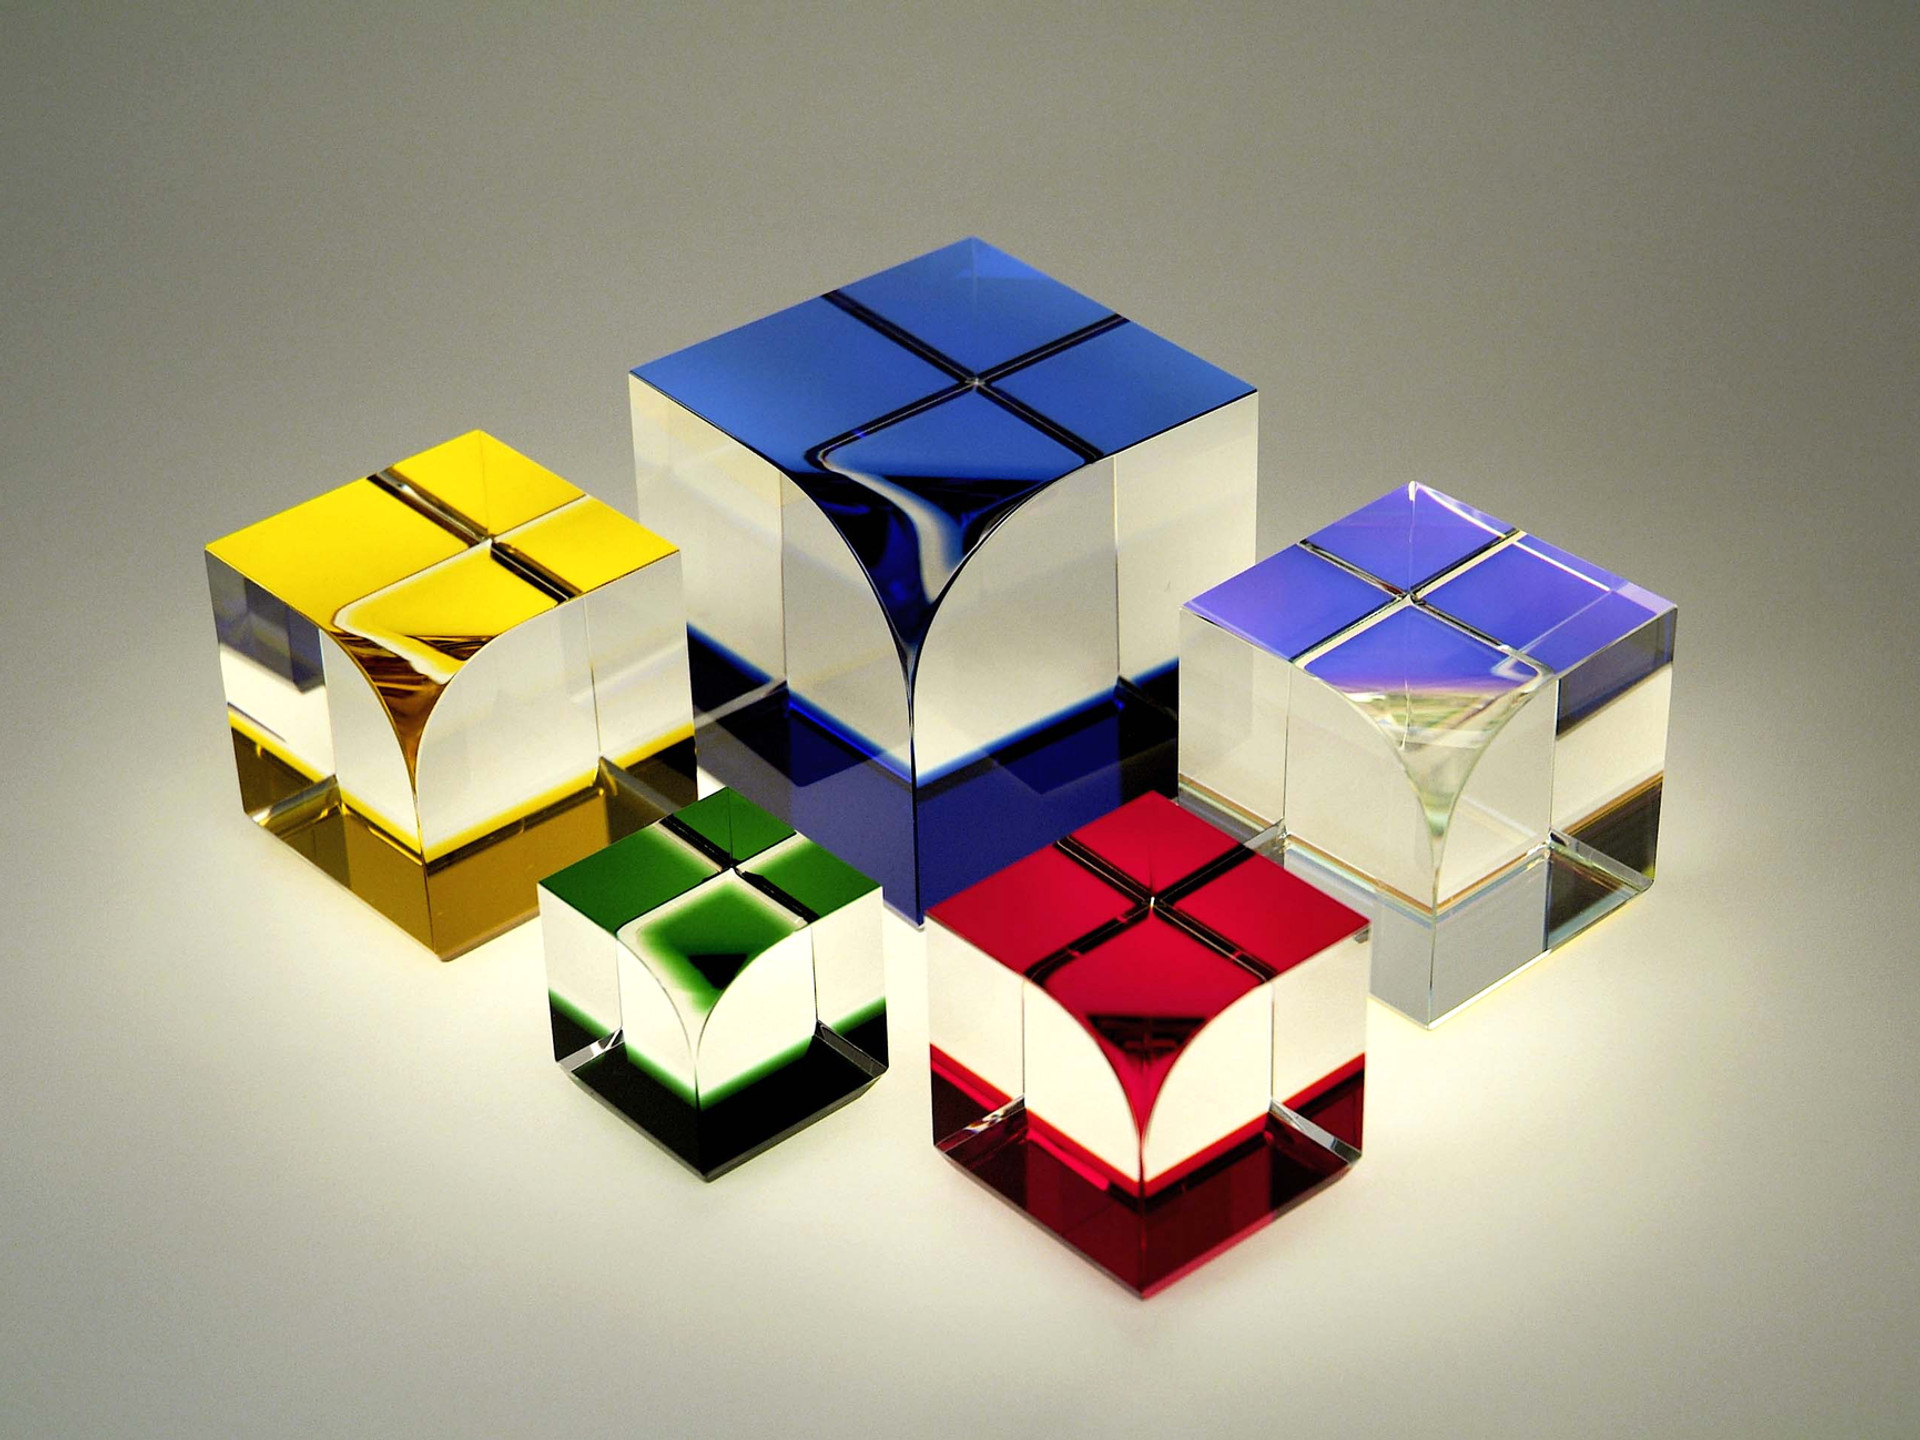 Individual cubes